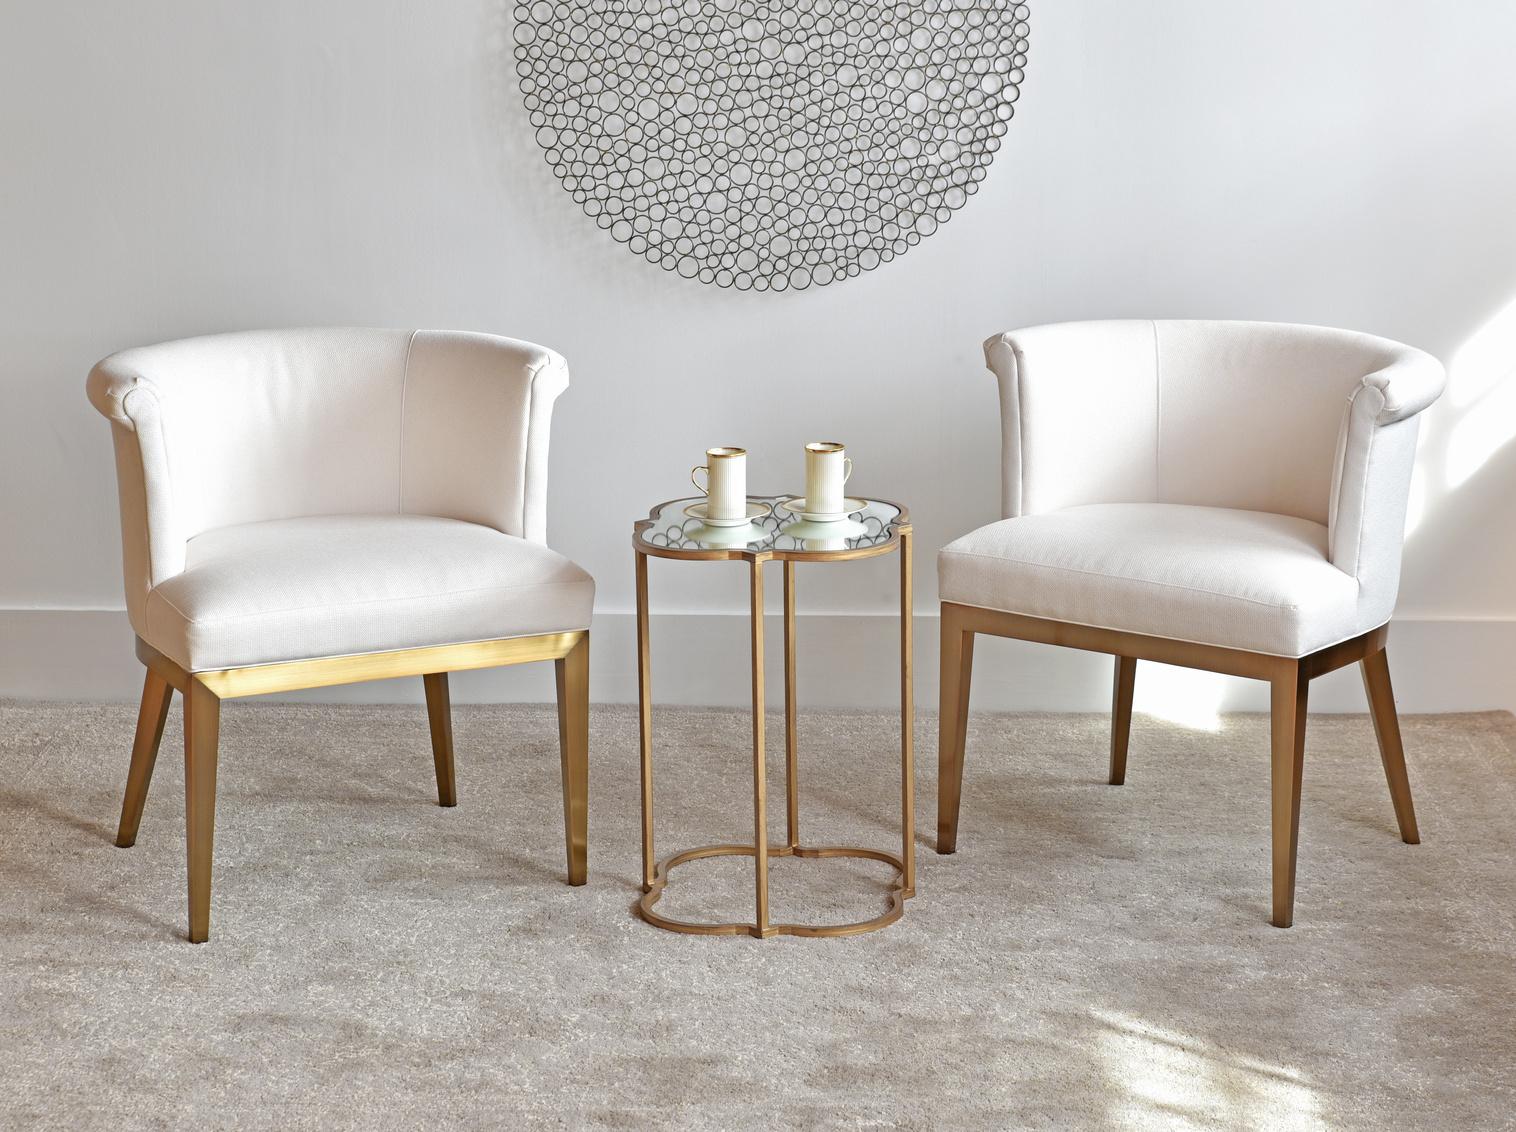 Charleston Forge Chair Dealer